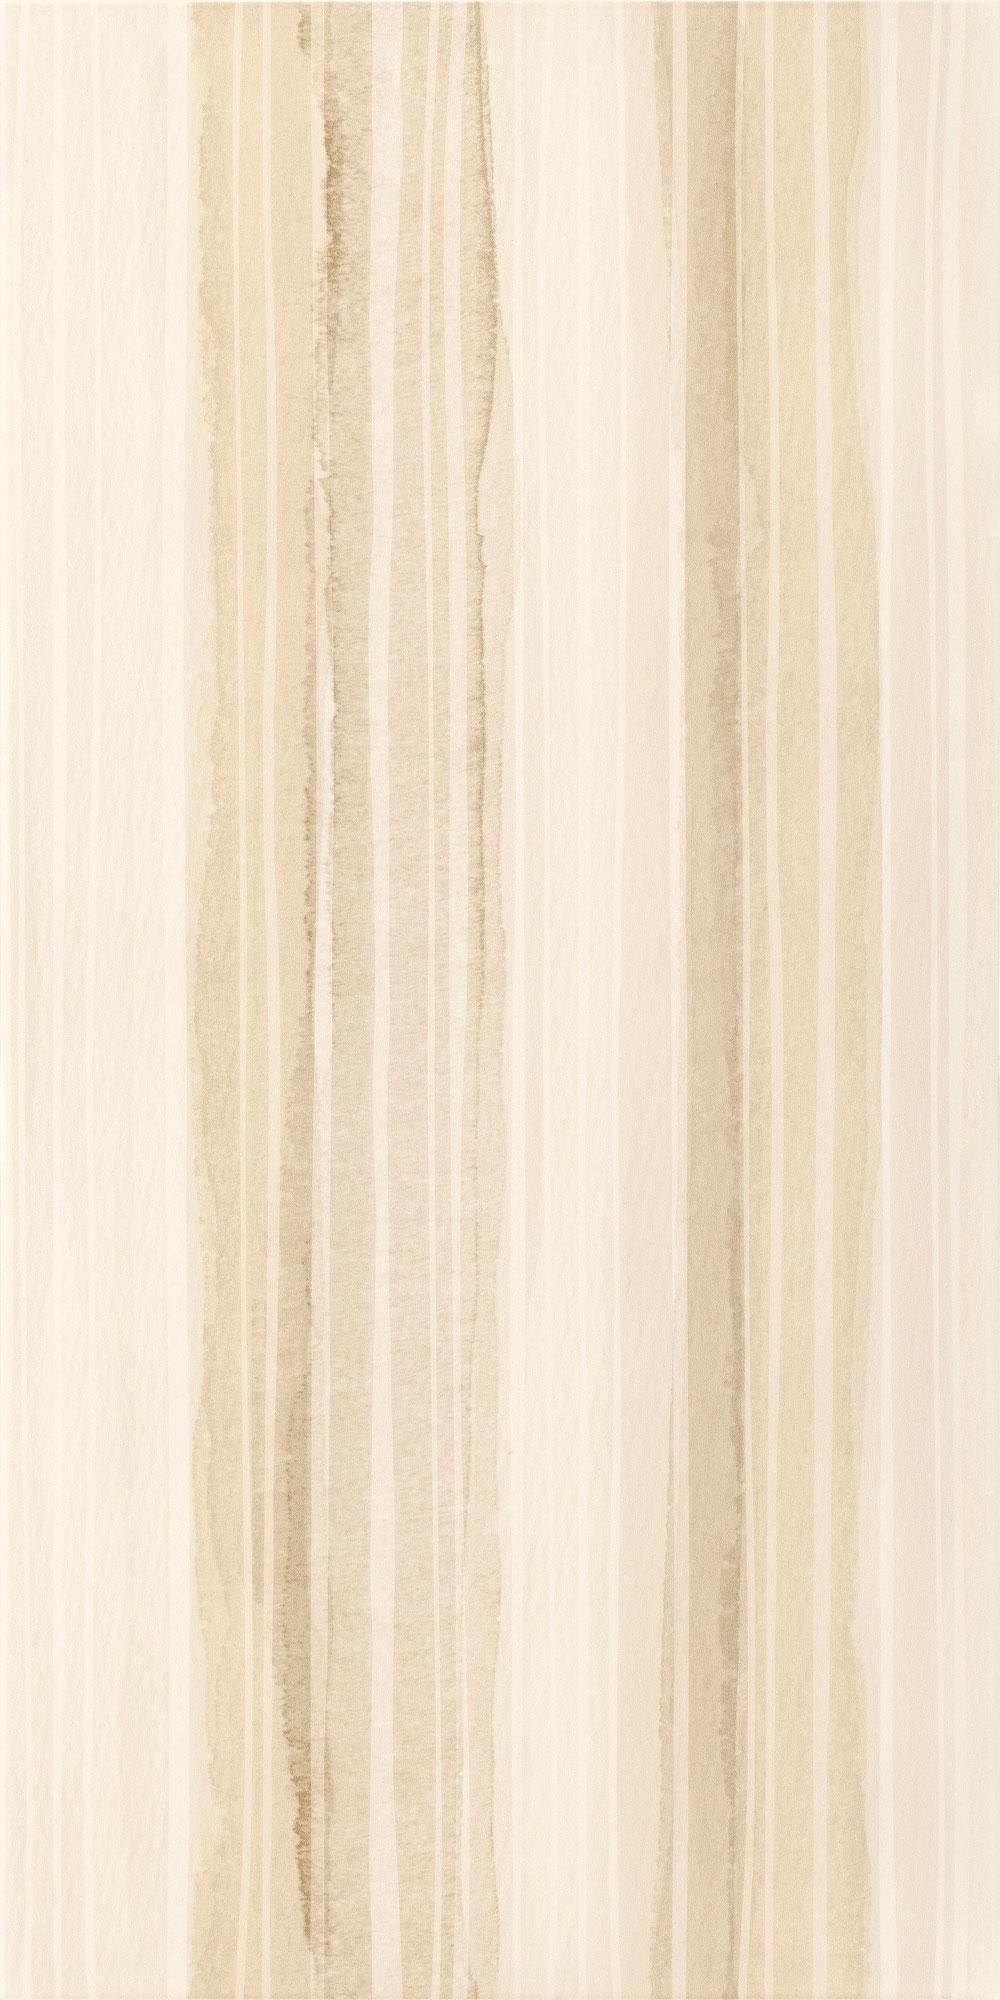 Настенная плитка Ceramika Paradyz Coraline Beige paski 30x60 (1,44) декор polcolorit dream beige caro 30x60